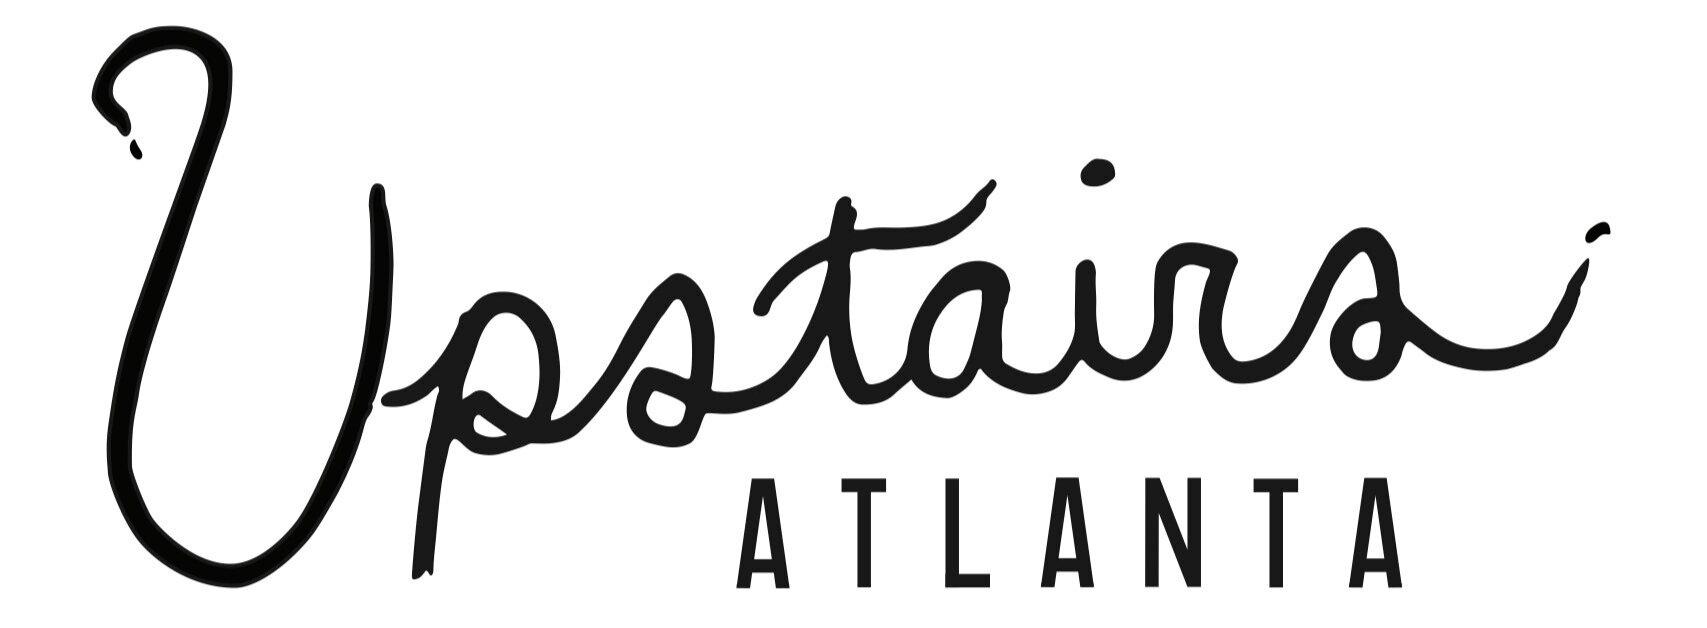 upstairs+atlanta+version+4.jpg